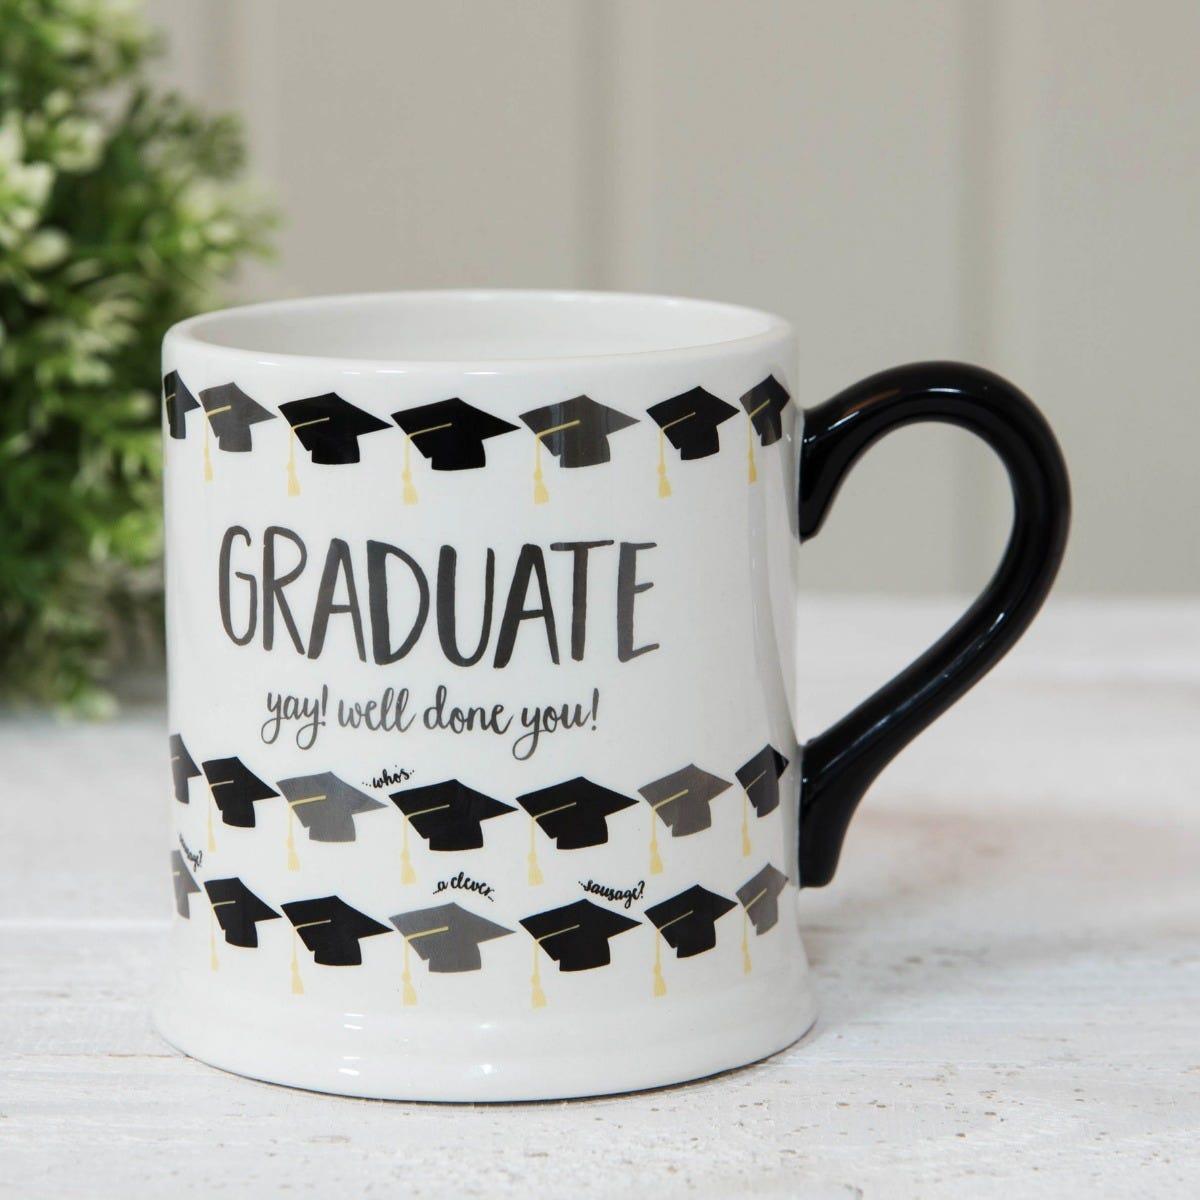 Best graduation gifts; Clintons' wendy jones-blackett graduation mug